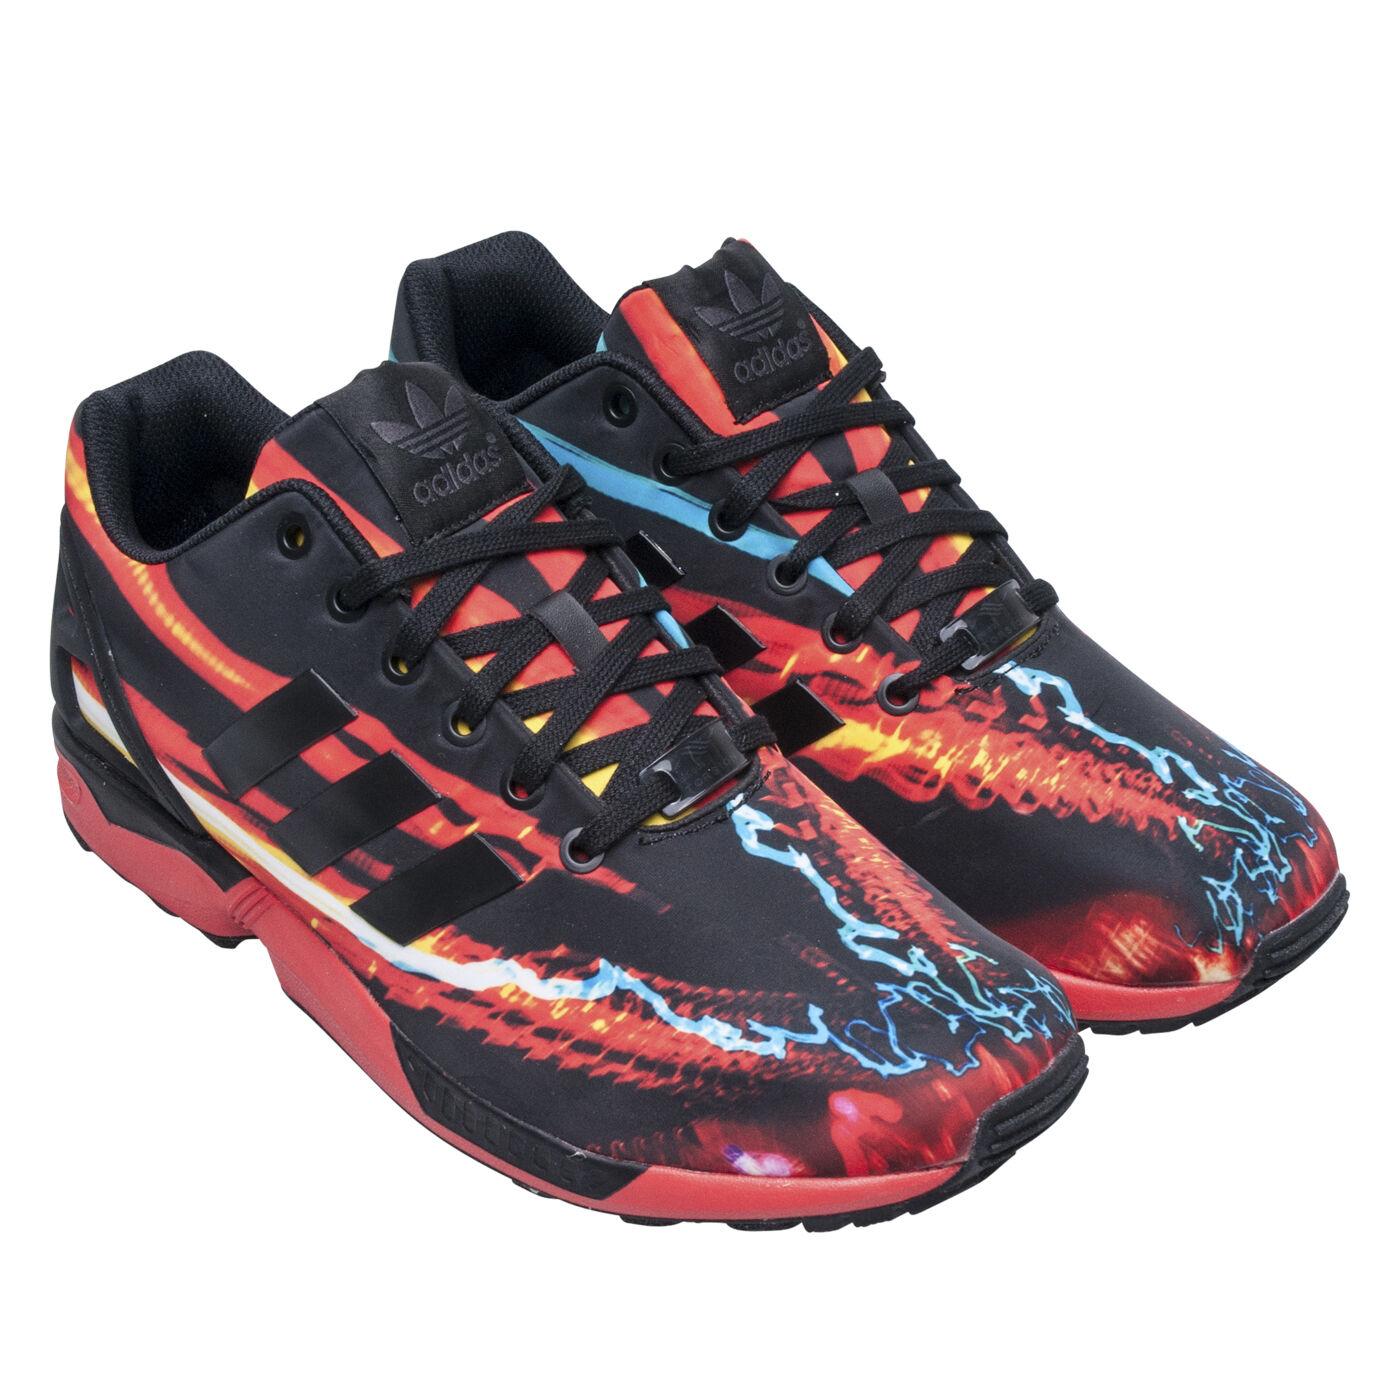 ~Adidas ZX FLUX PHOTO PRINT Running 8000 TORSION Boost Workout Shoe~Uomo sz 10.5